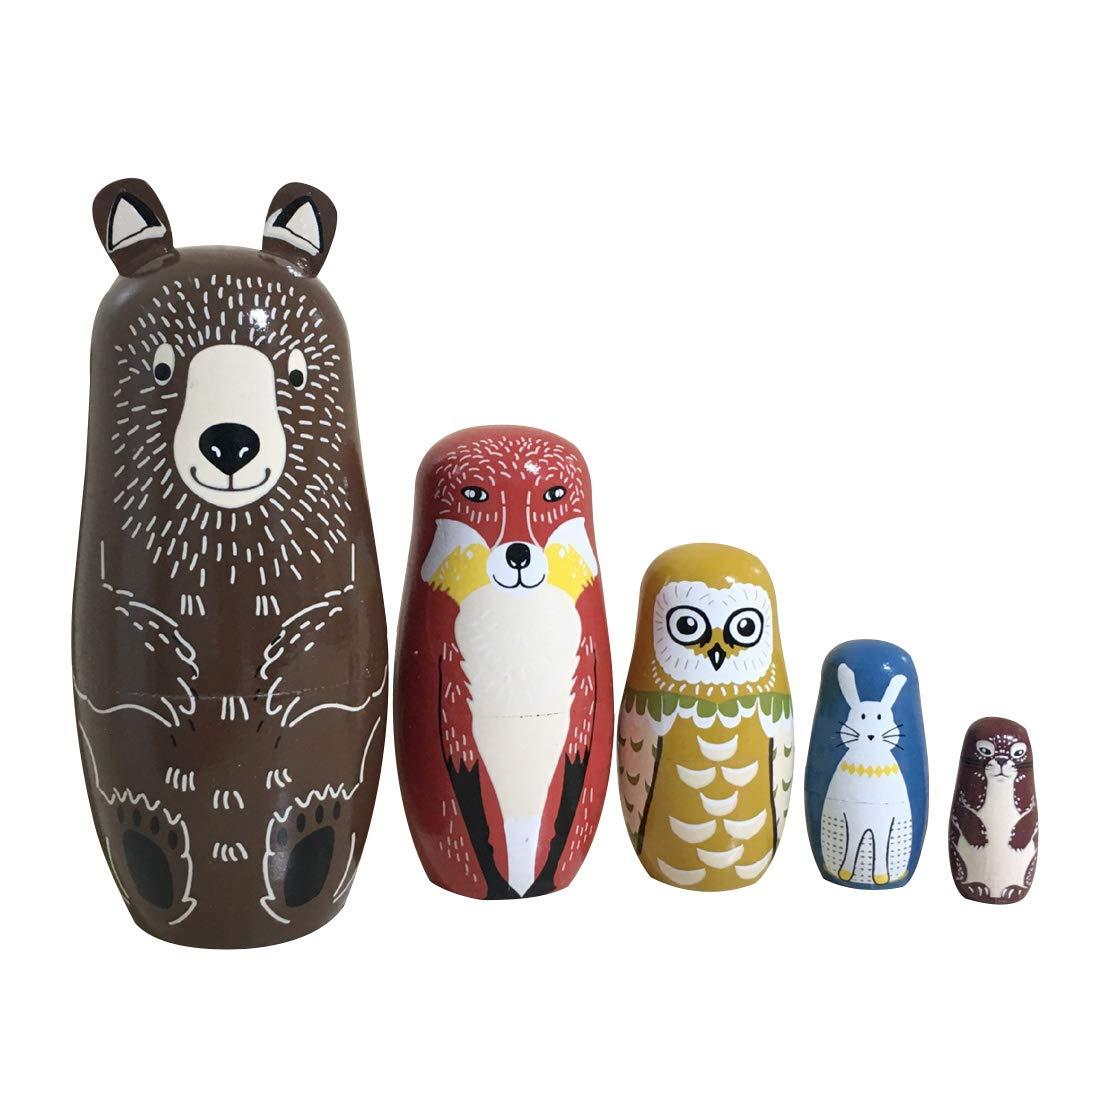 Helen-sky 5pcs Wooden Russian Nesting Dolls Cartoon Bear Fox Owl Matryoshka Dolls Handmade Kids Christmas Birthday Gift Home Decorations (5 pcs)